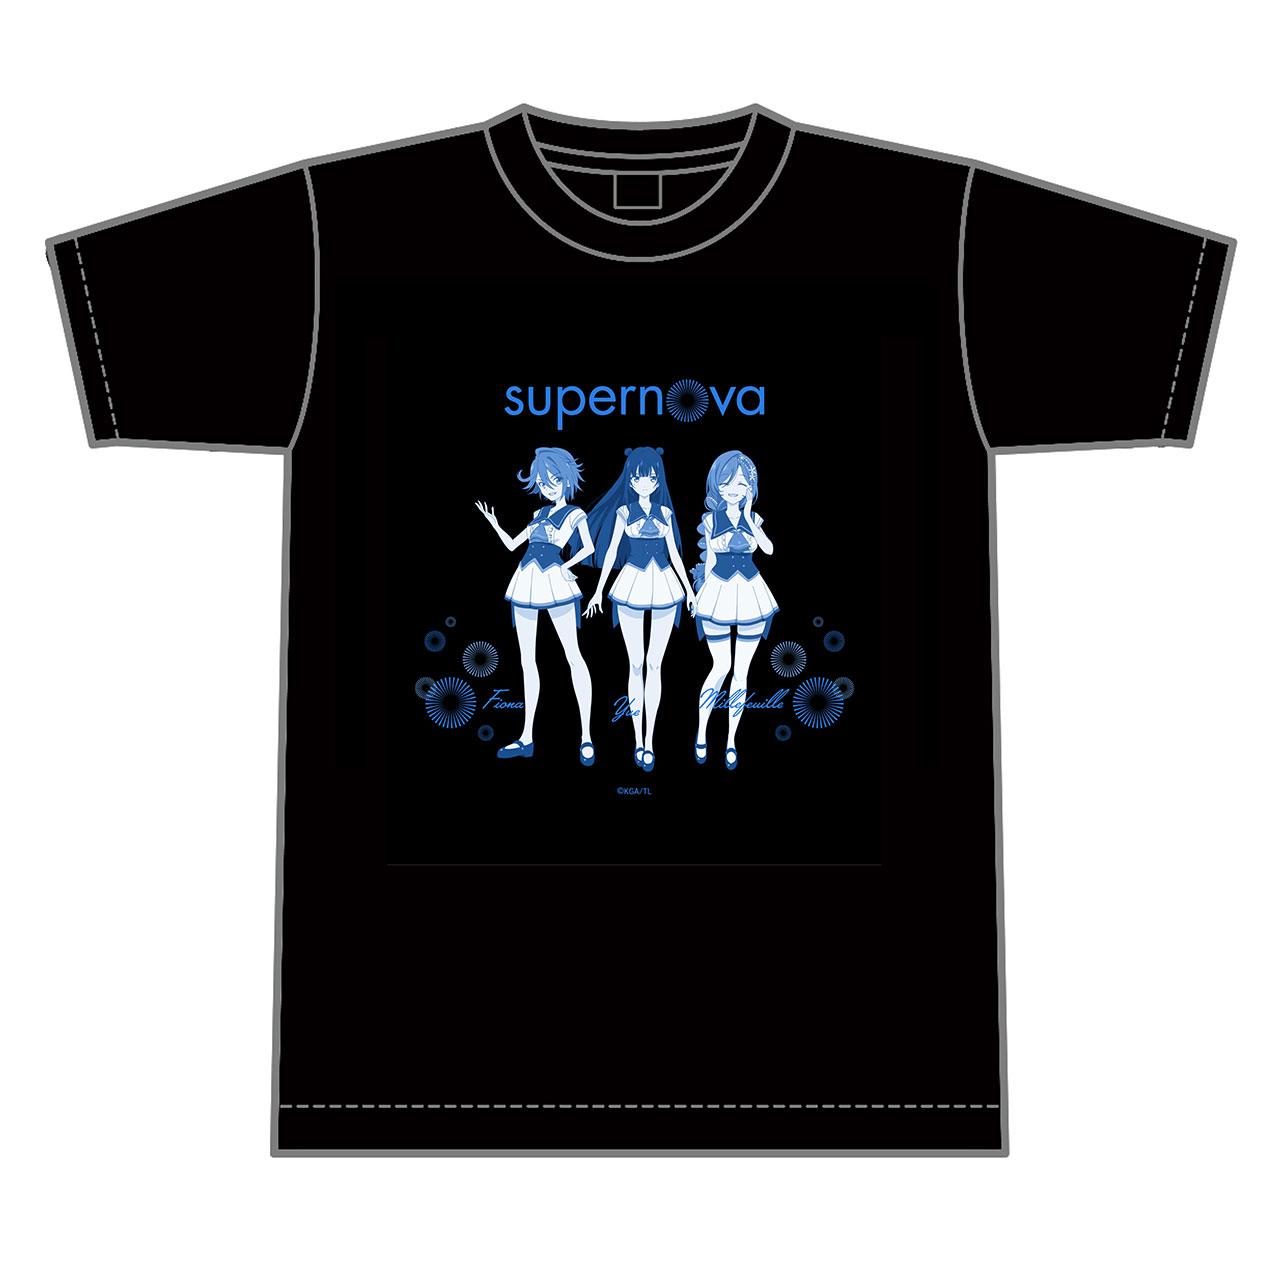 supernova Tシャツ 黒